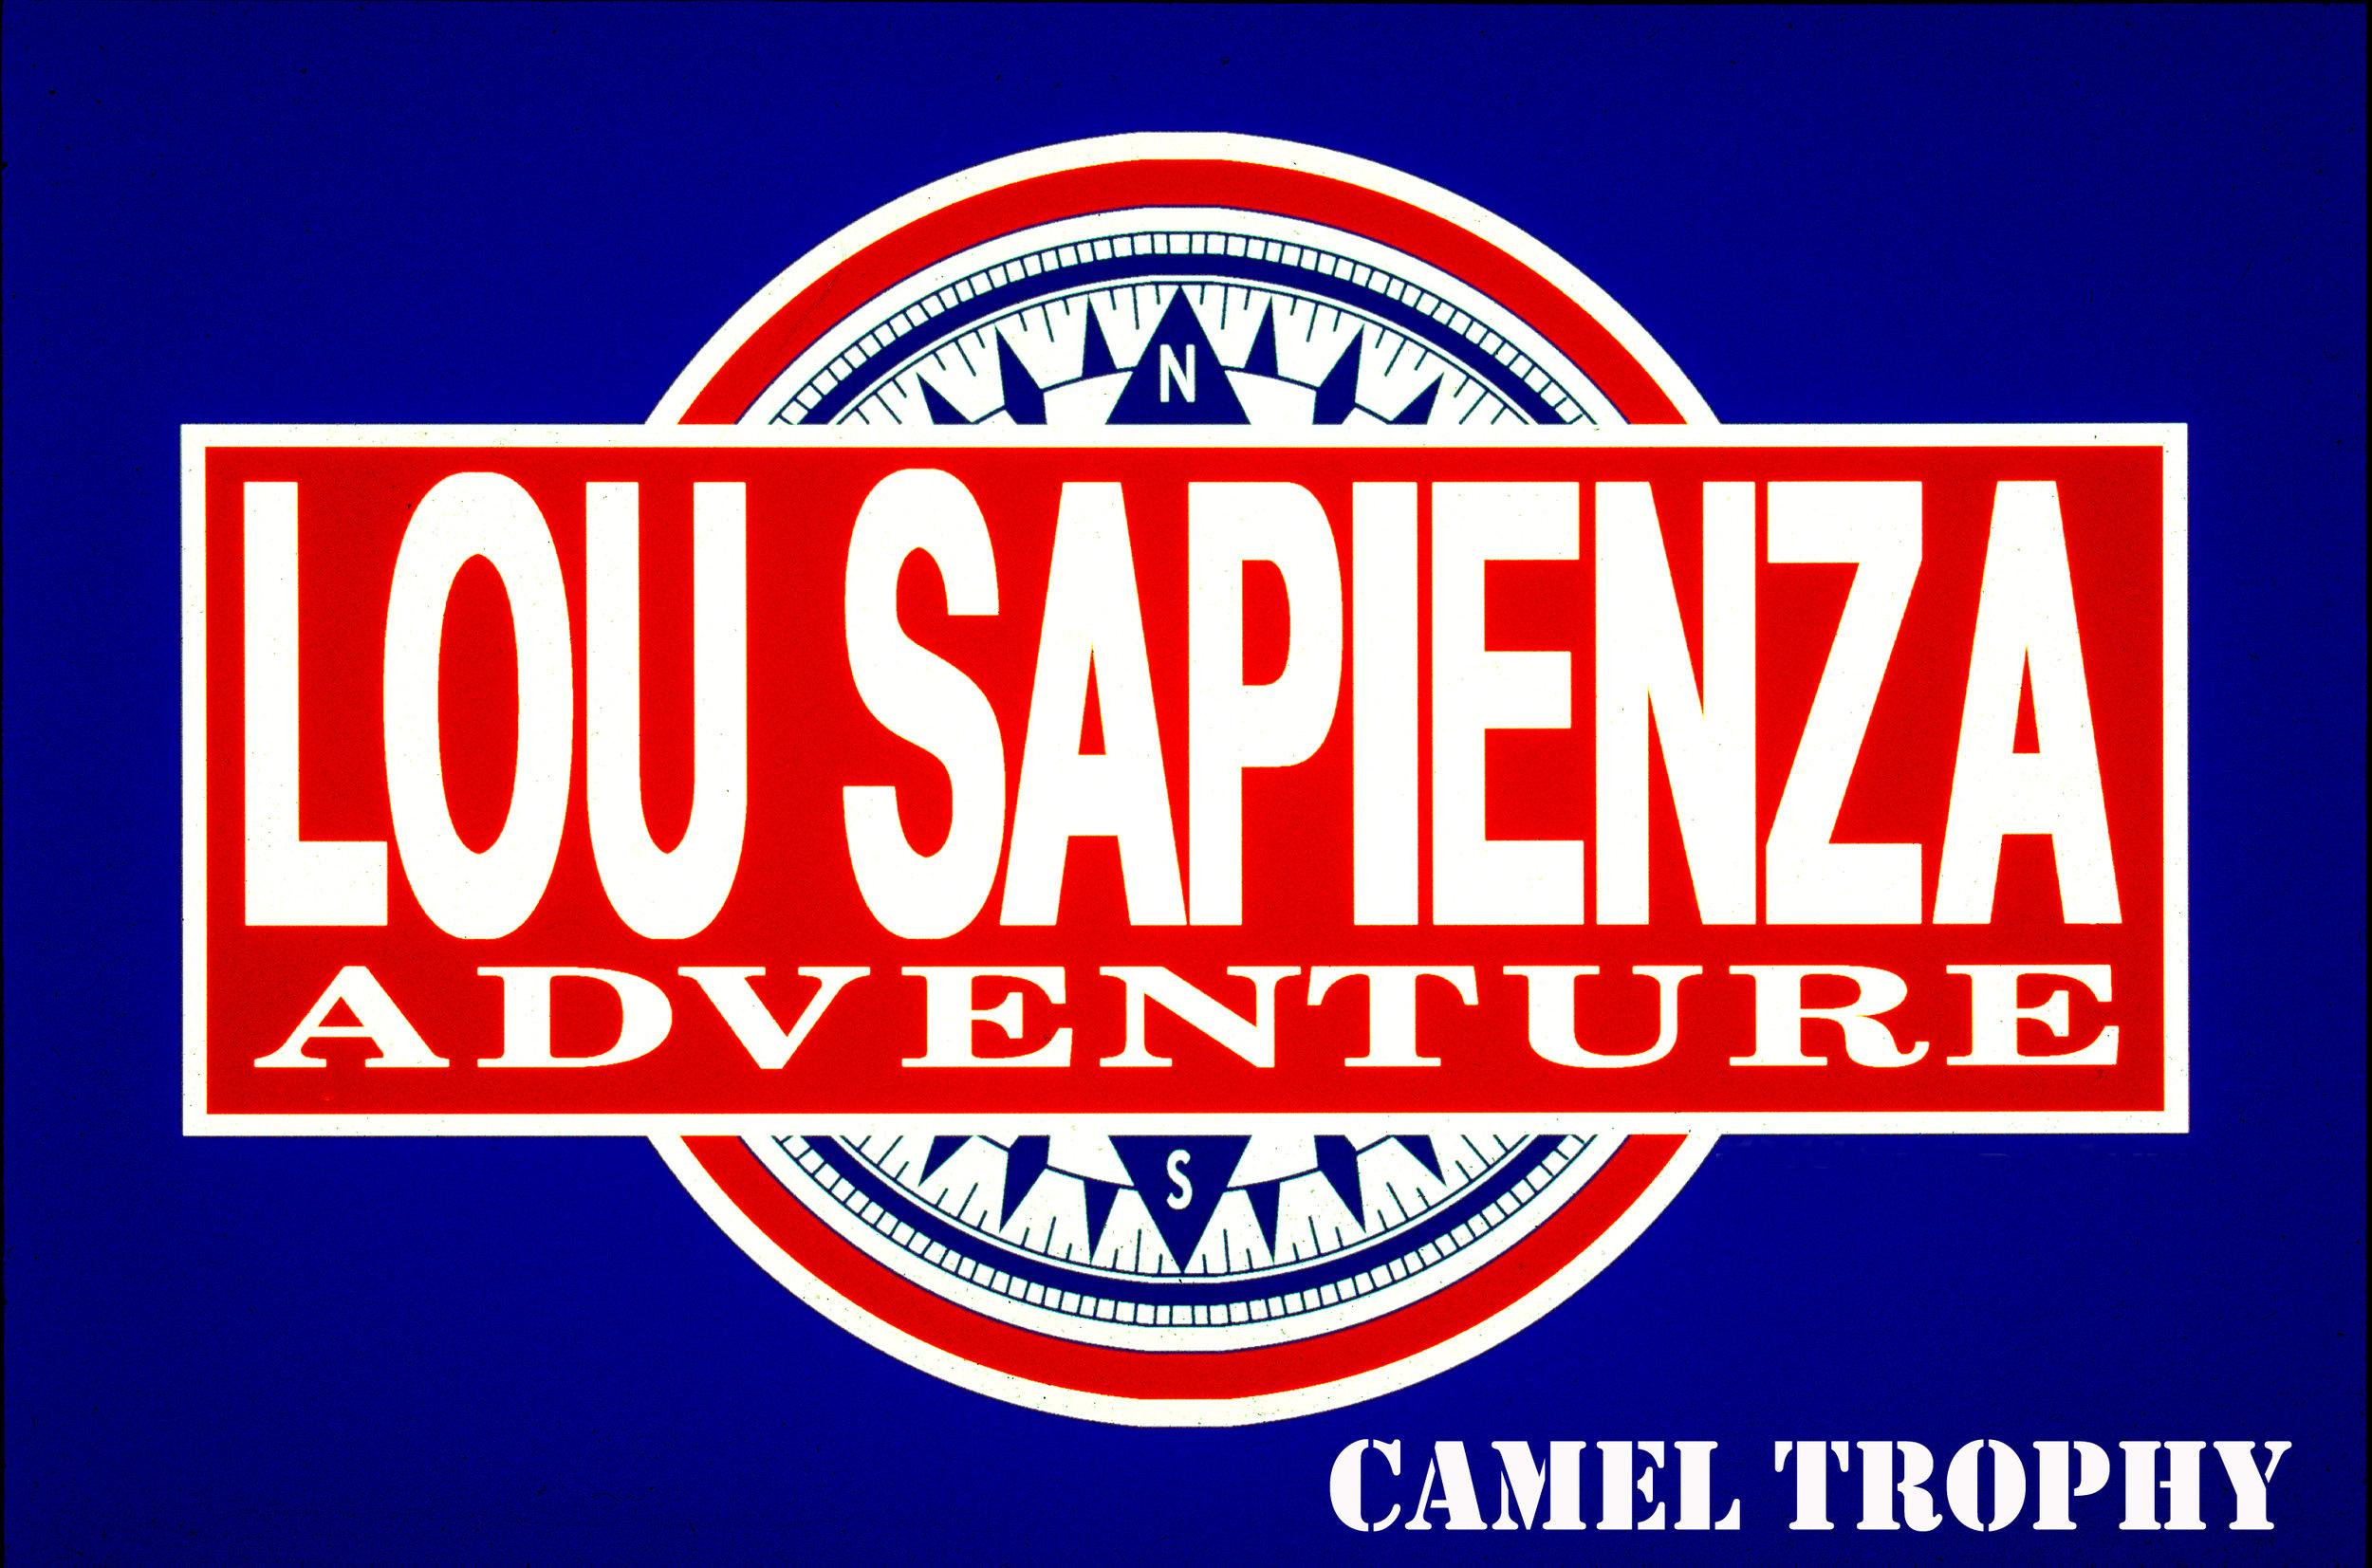 CT_000 Logo Camel_Trophy.jpg